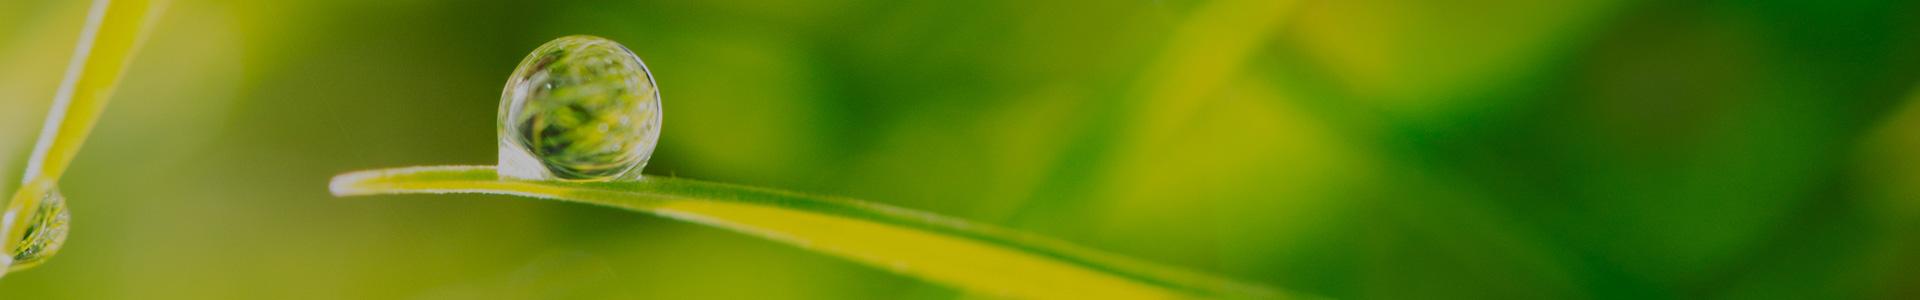 Servizi ambientali Varese